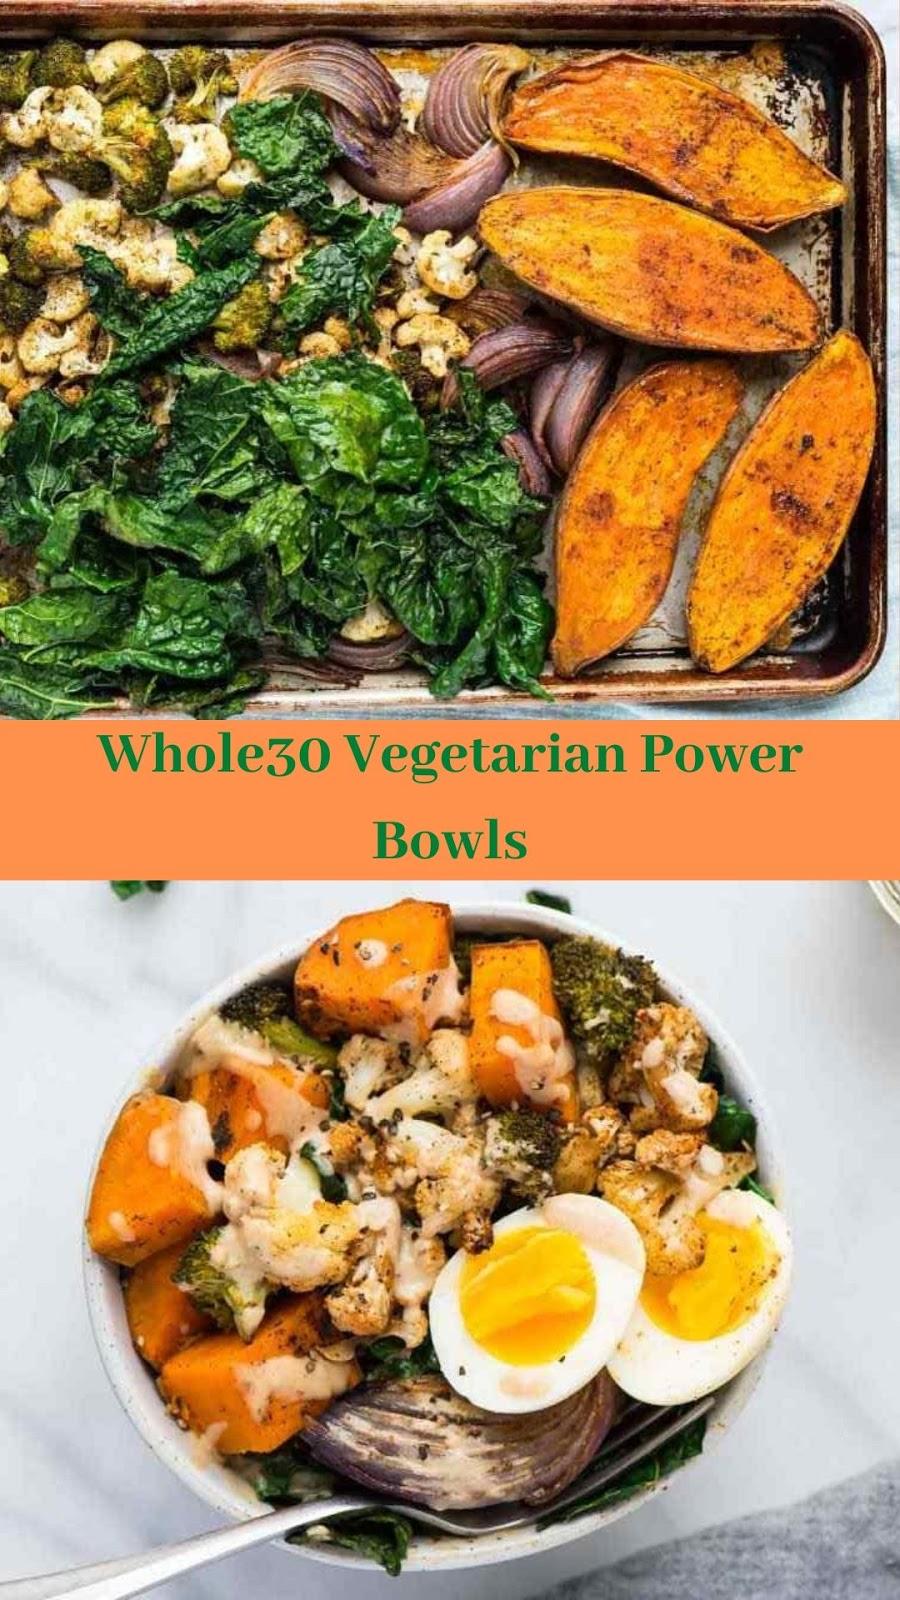 Whole30 Vegetarian Power Bowls